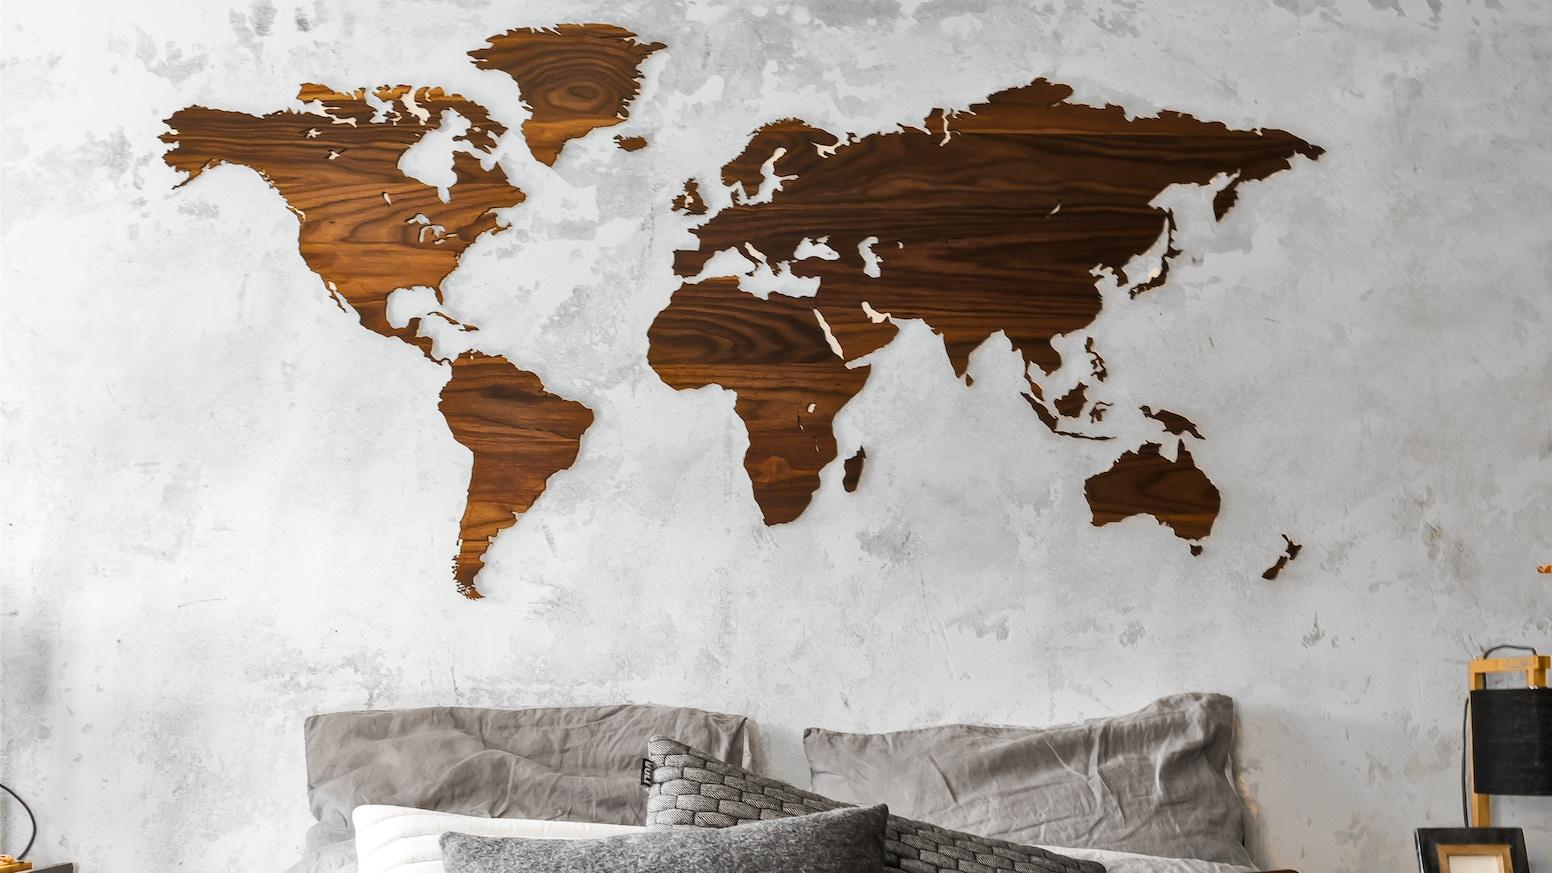 My Wooden World | Luxurious wooden world maps by Maarten van Rooyen on